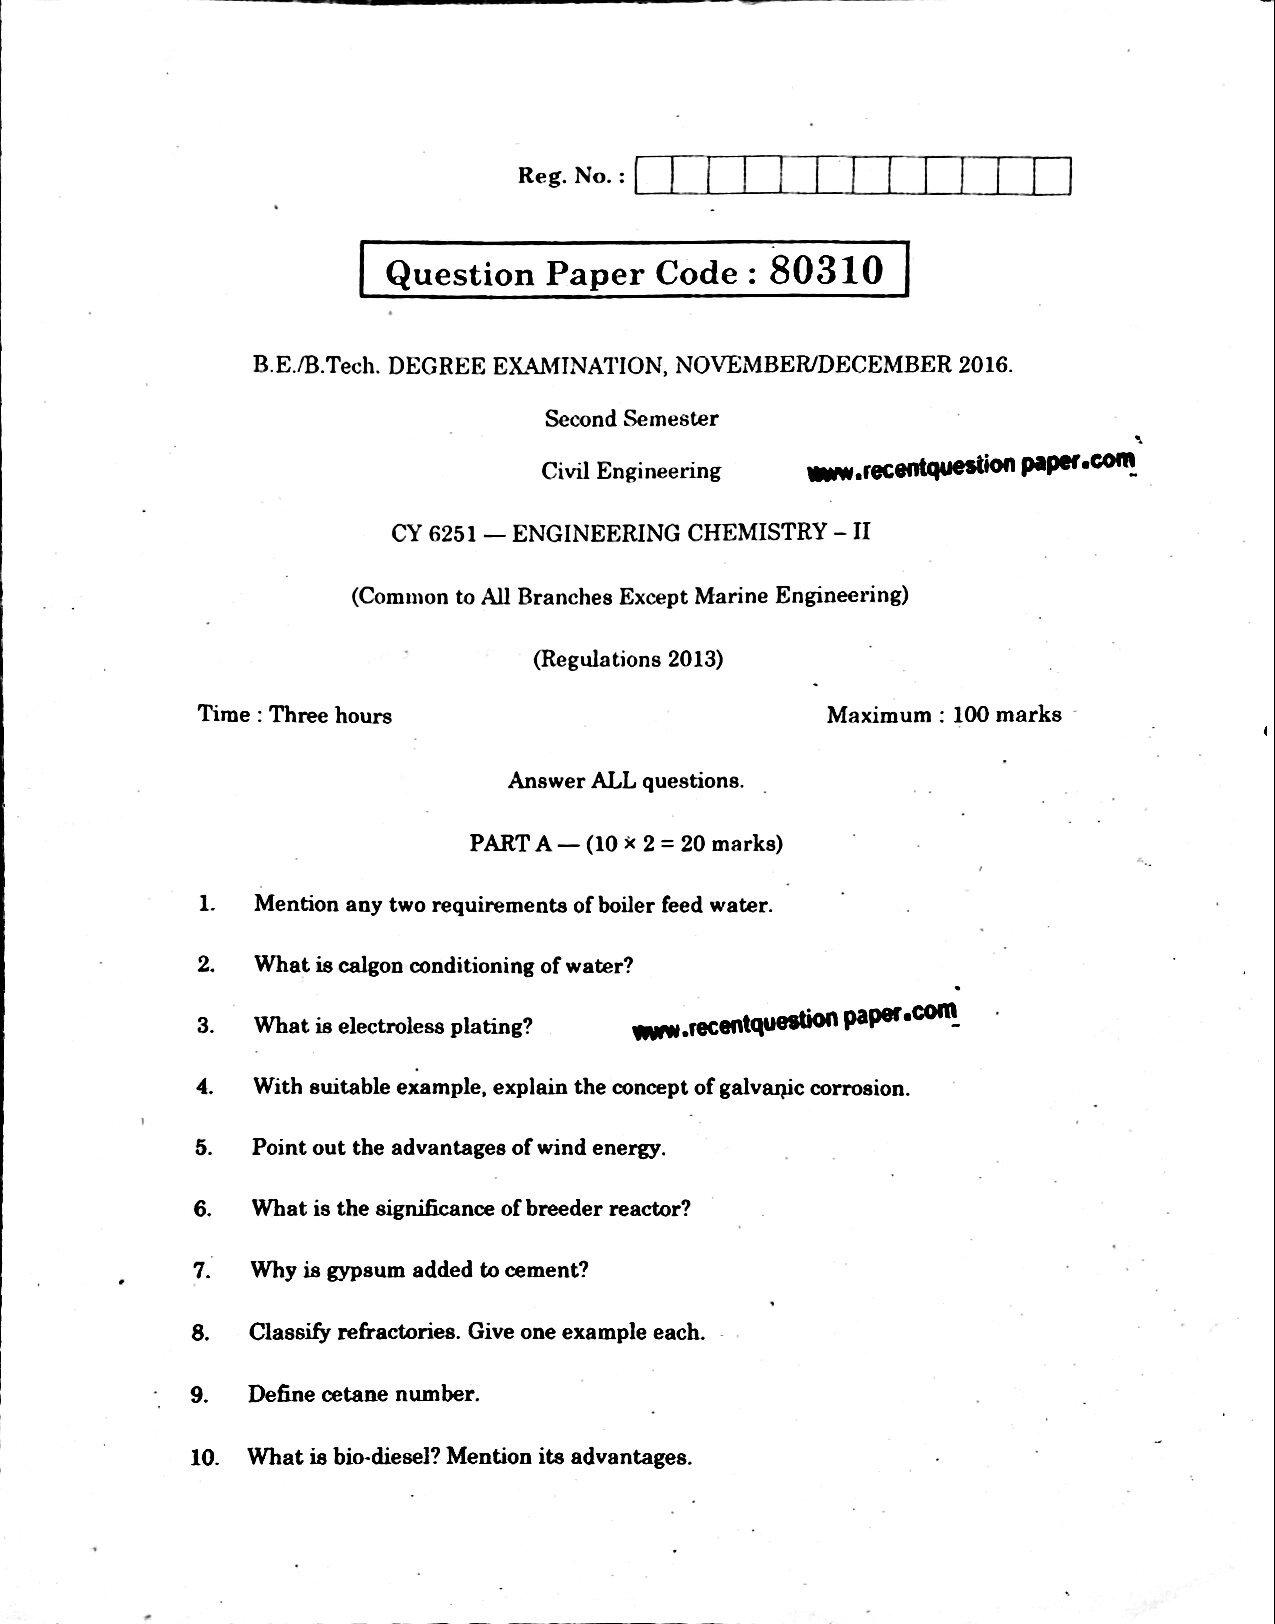 CY6251 Engineering Chemistry-II Anna University Question paper Nov/Dec 2016